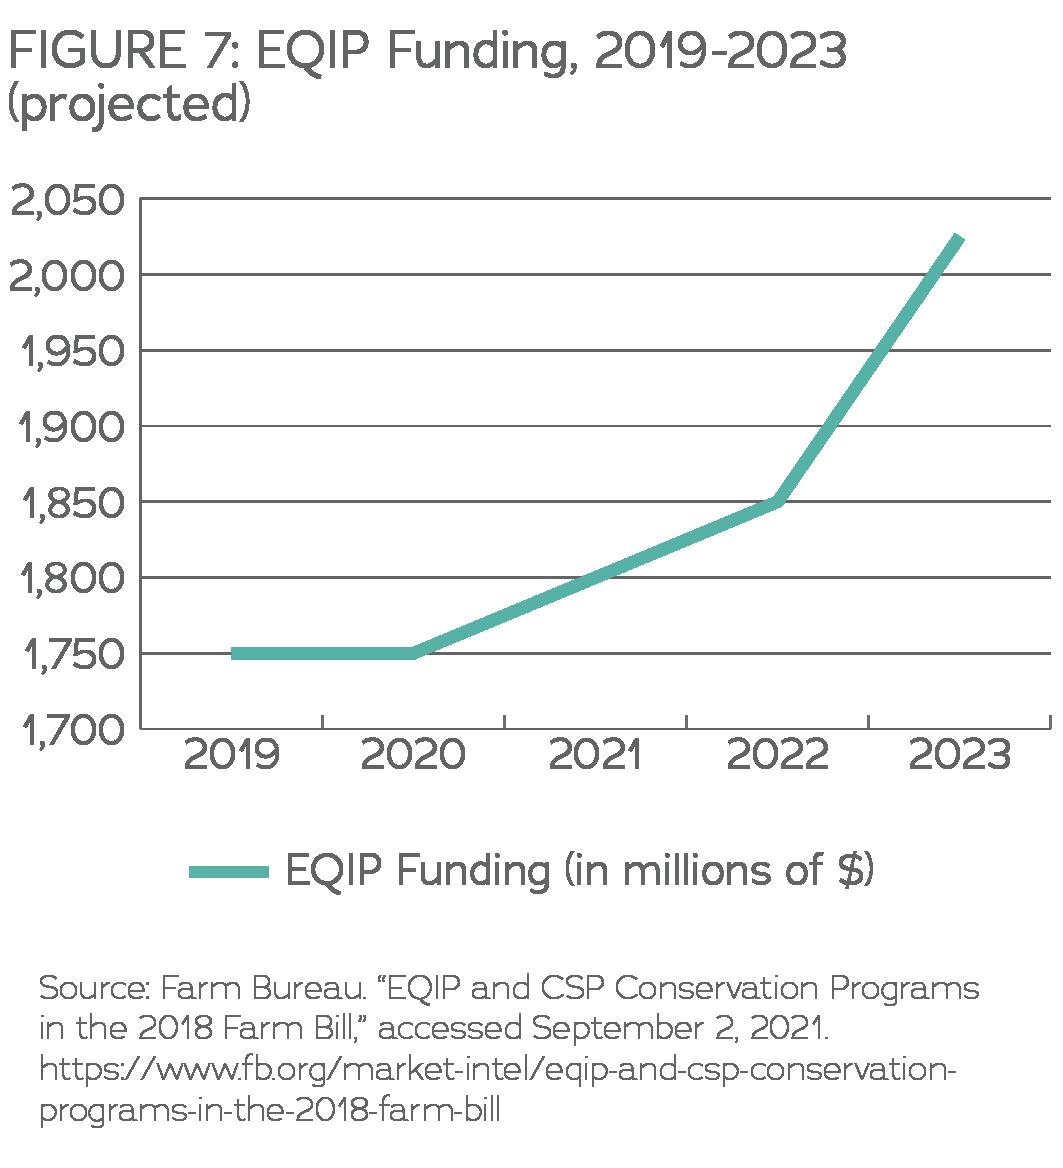 EQIP Funding 2019-2023